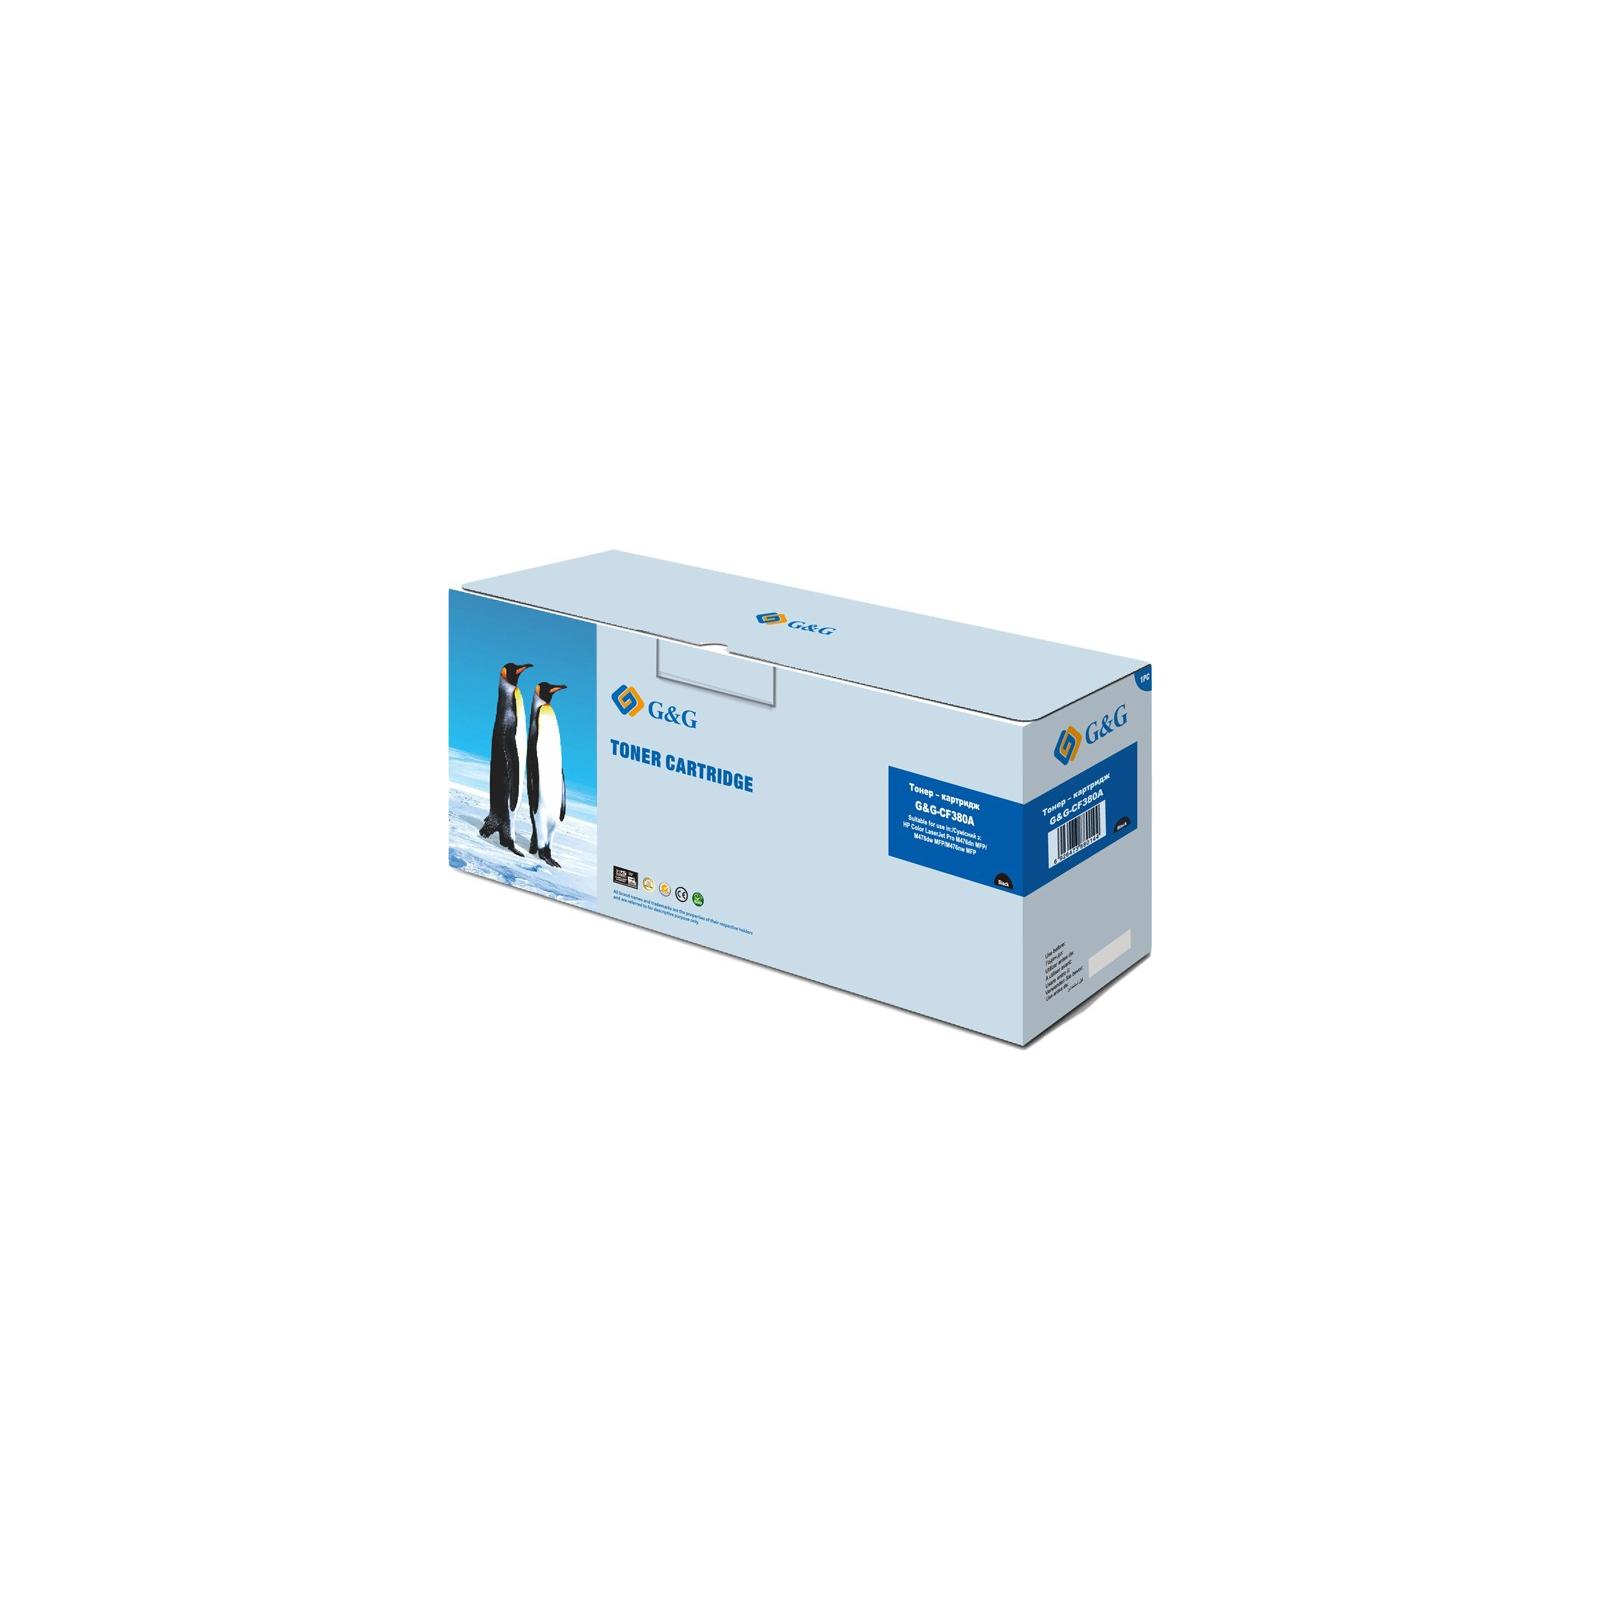 Картридж G&G для HP LJ Pro M476dn/M476dw/M476nw Black (G&G-CF380A)